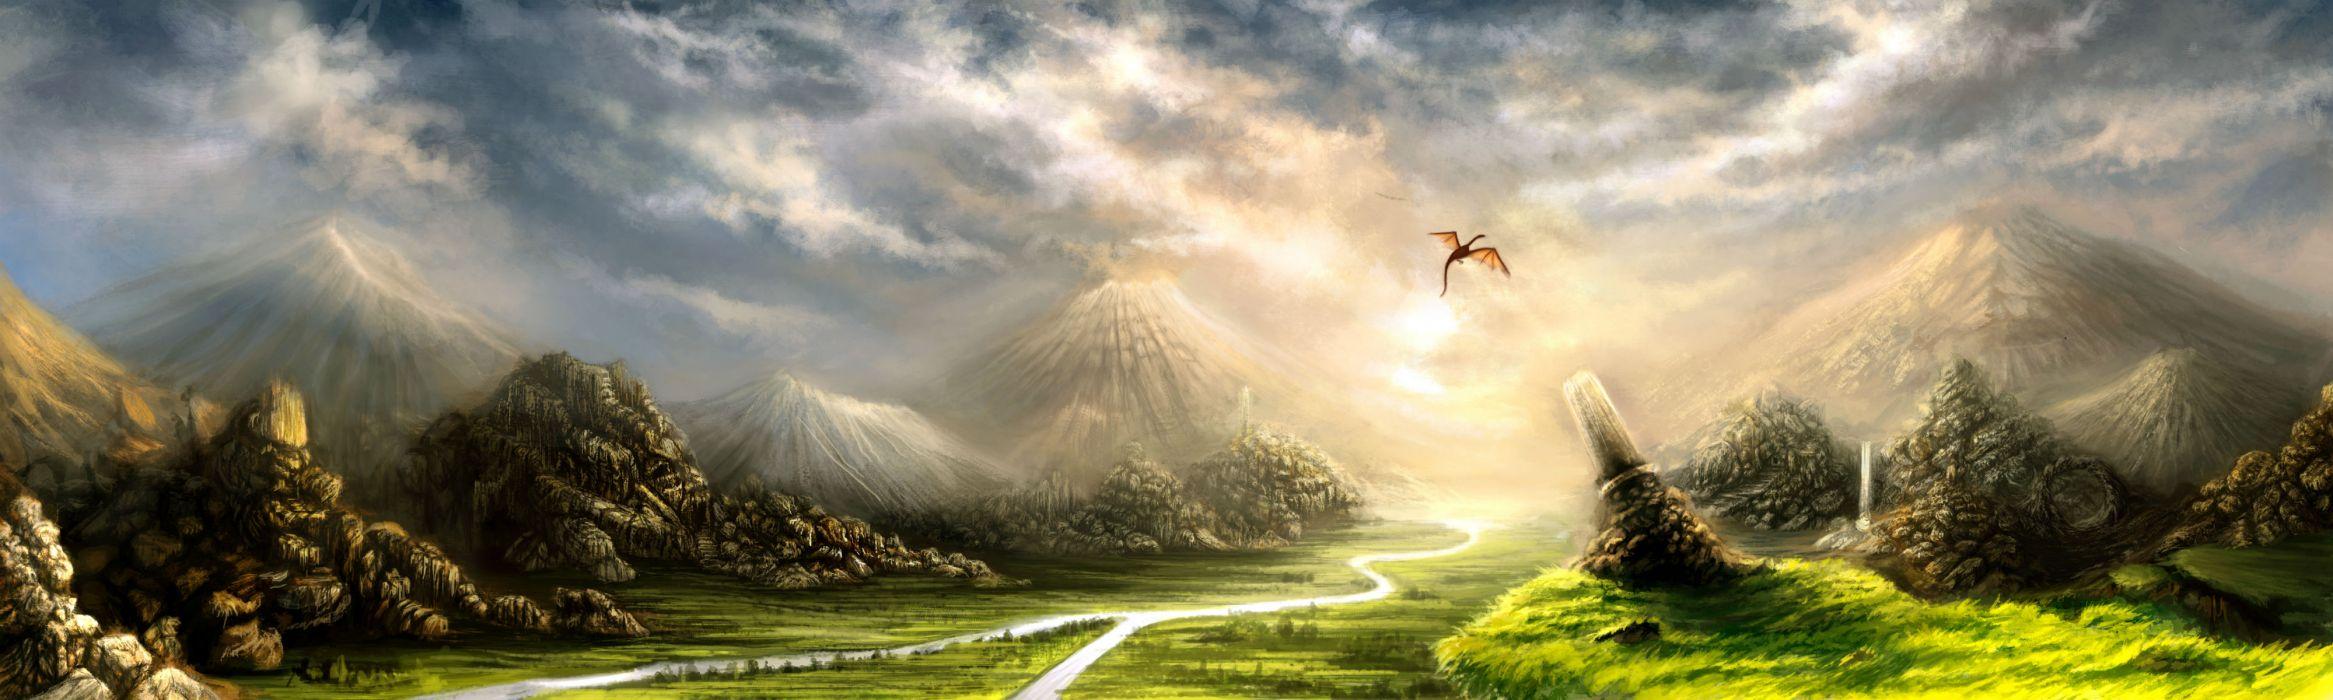 dragon magical       gd wallpaper